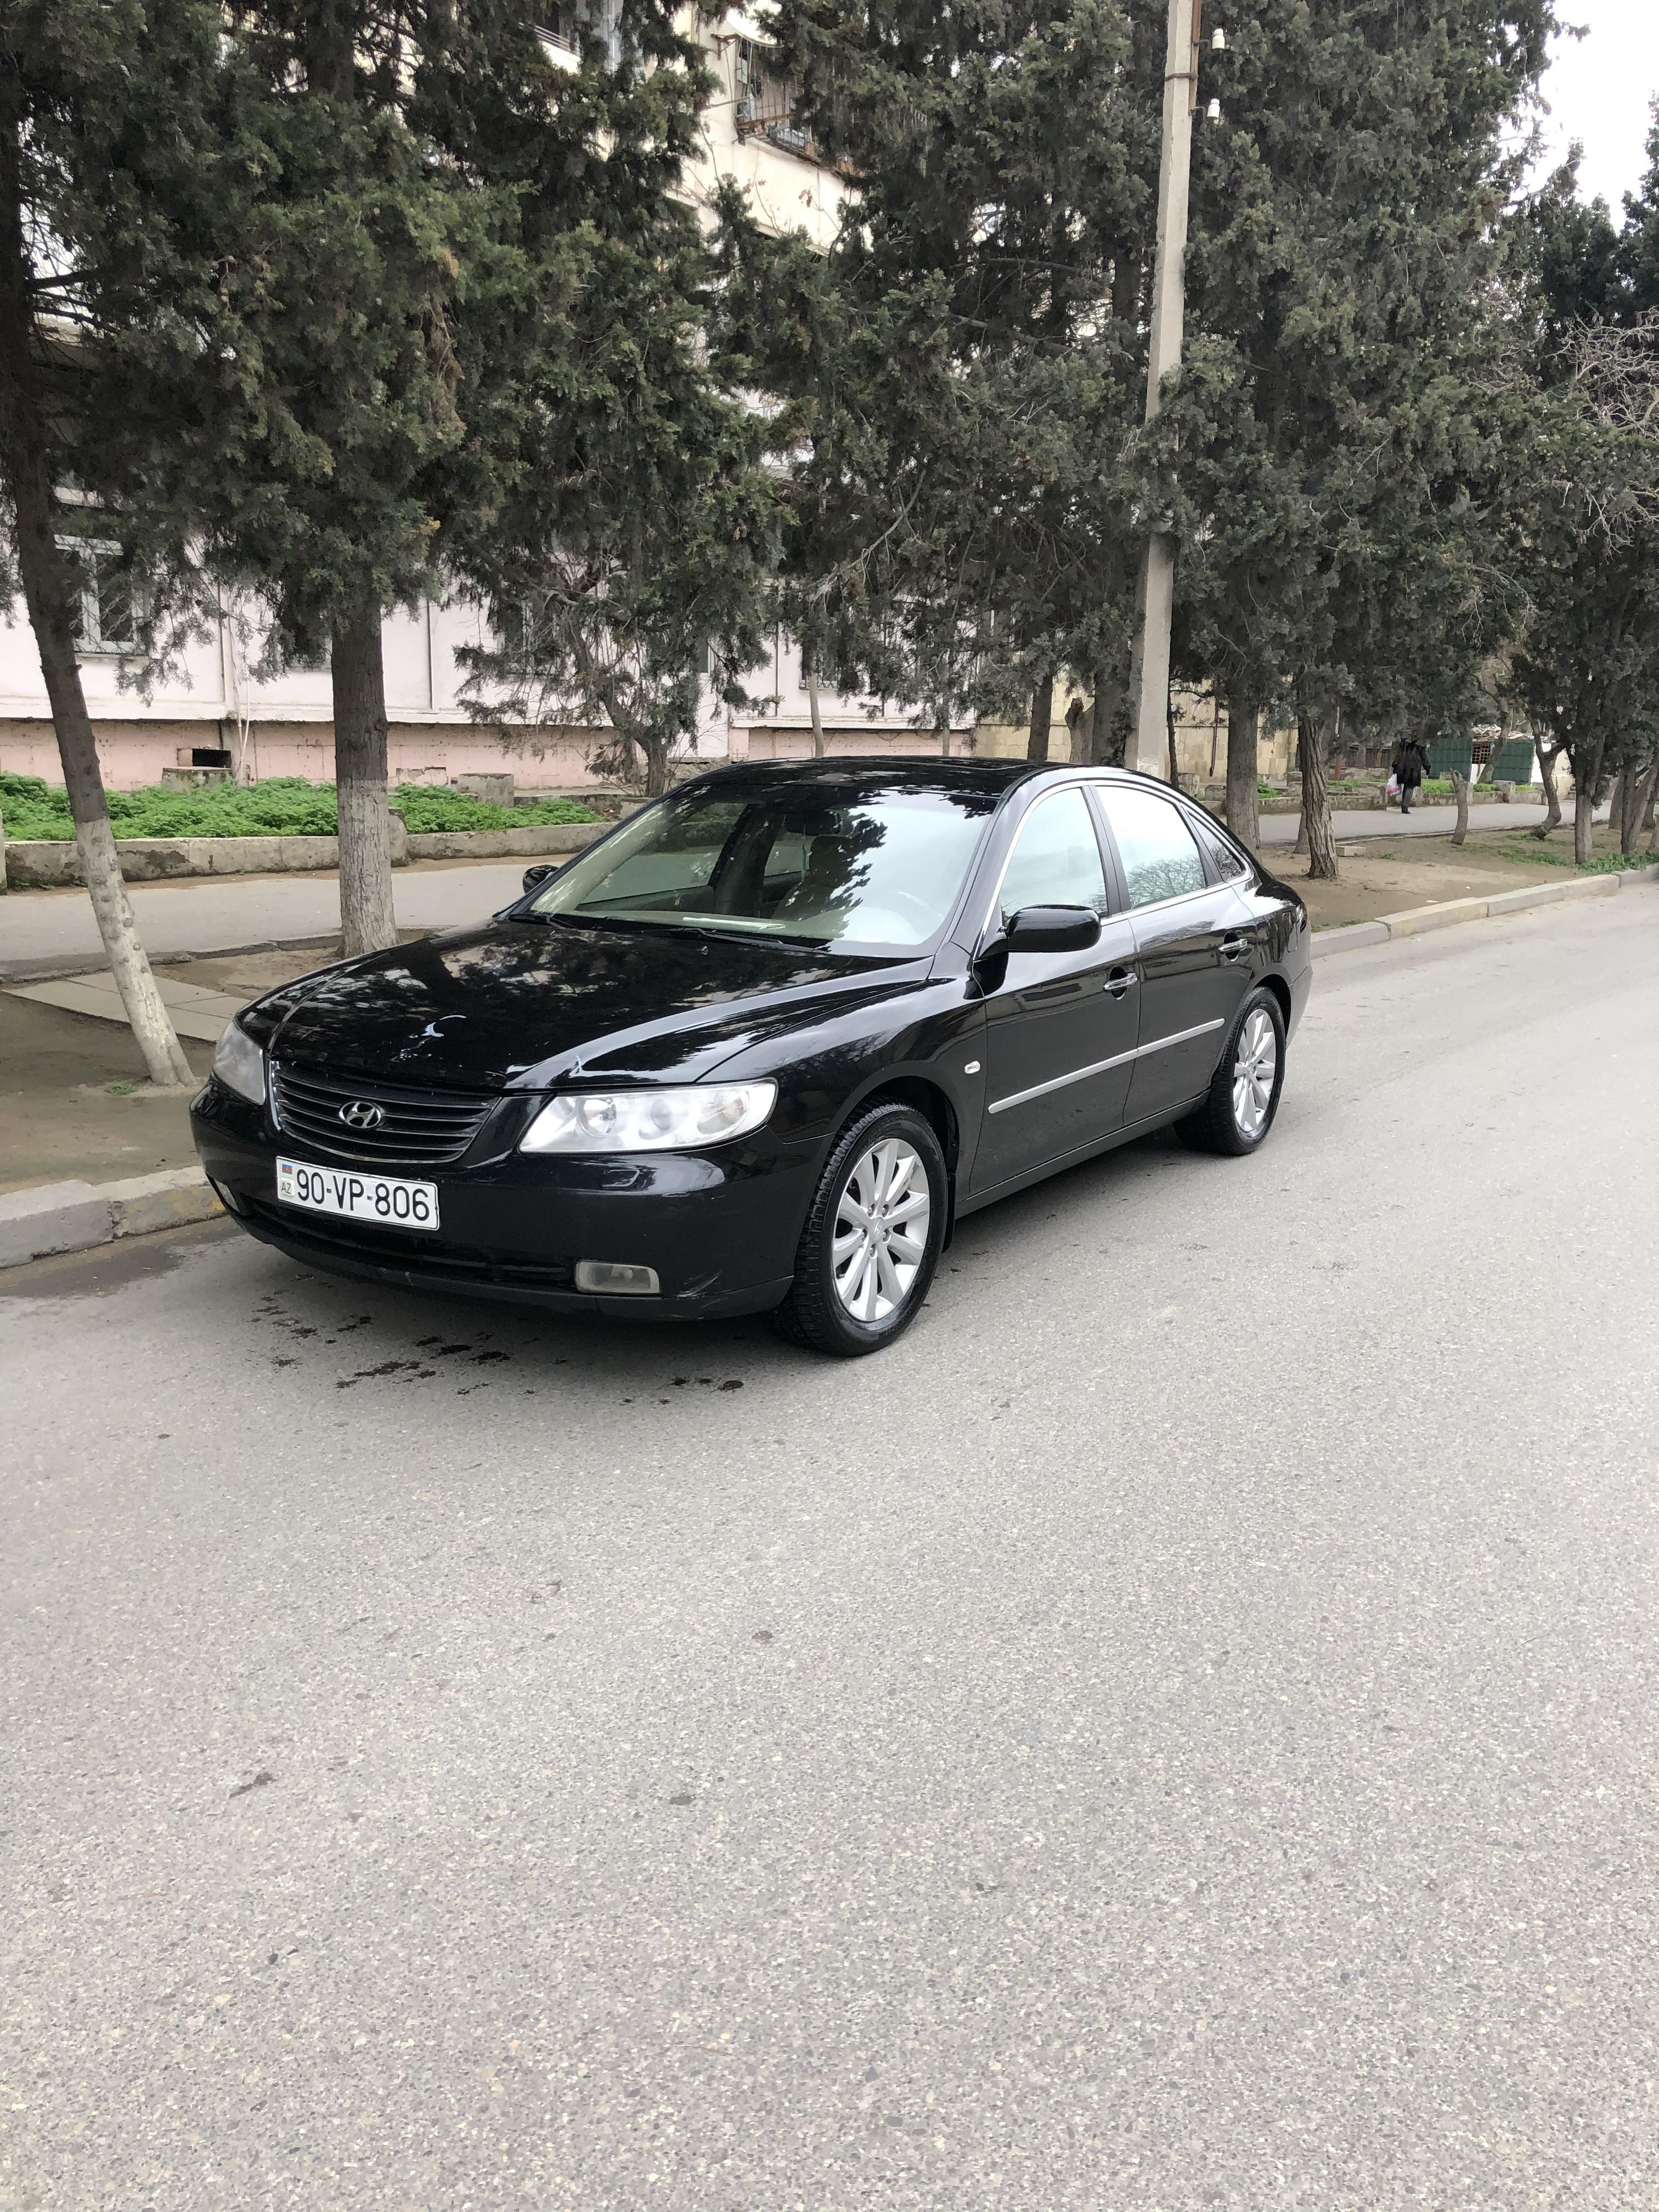 Hyundai Grandeur/Azera 2.7(lt) 2008 İkinci əl  $15000